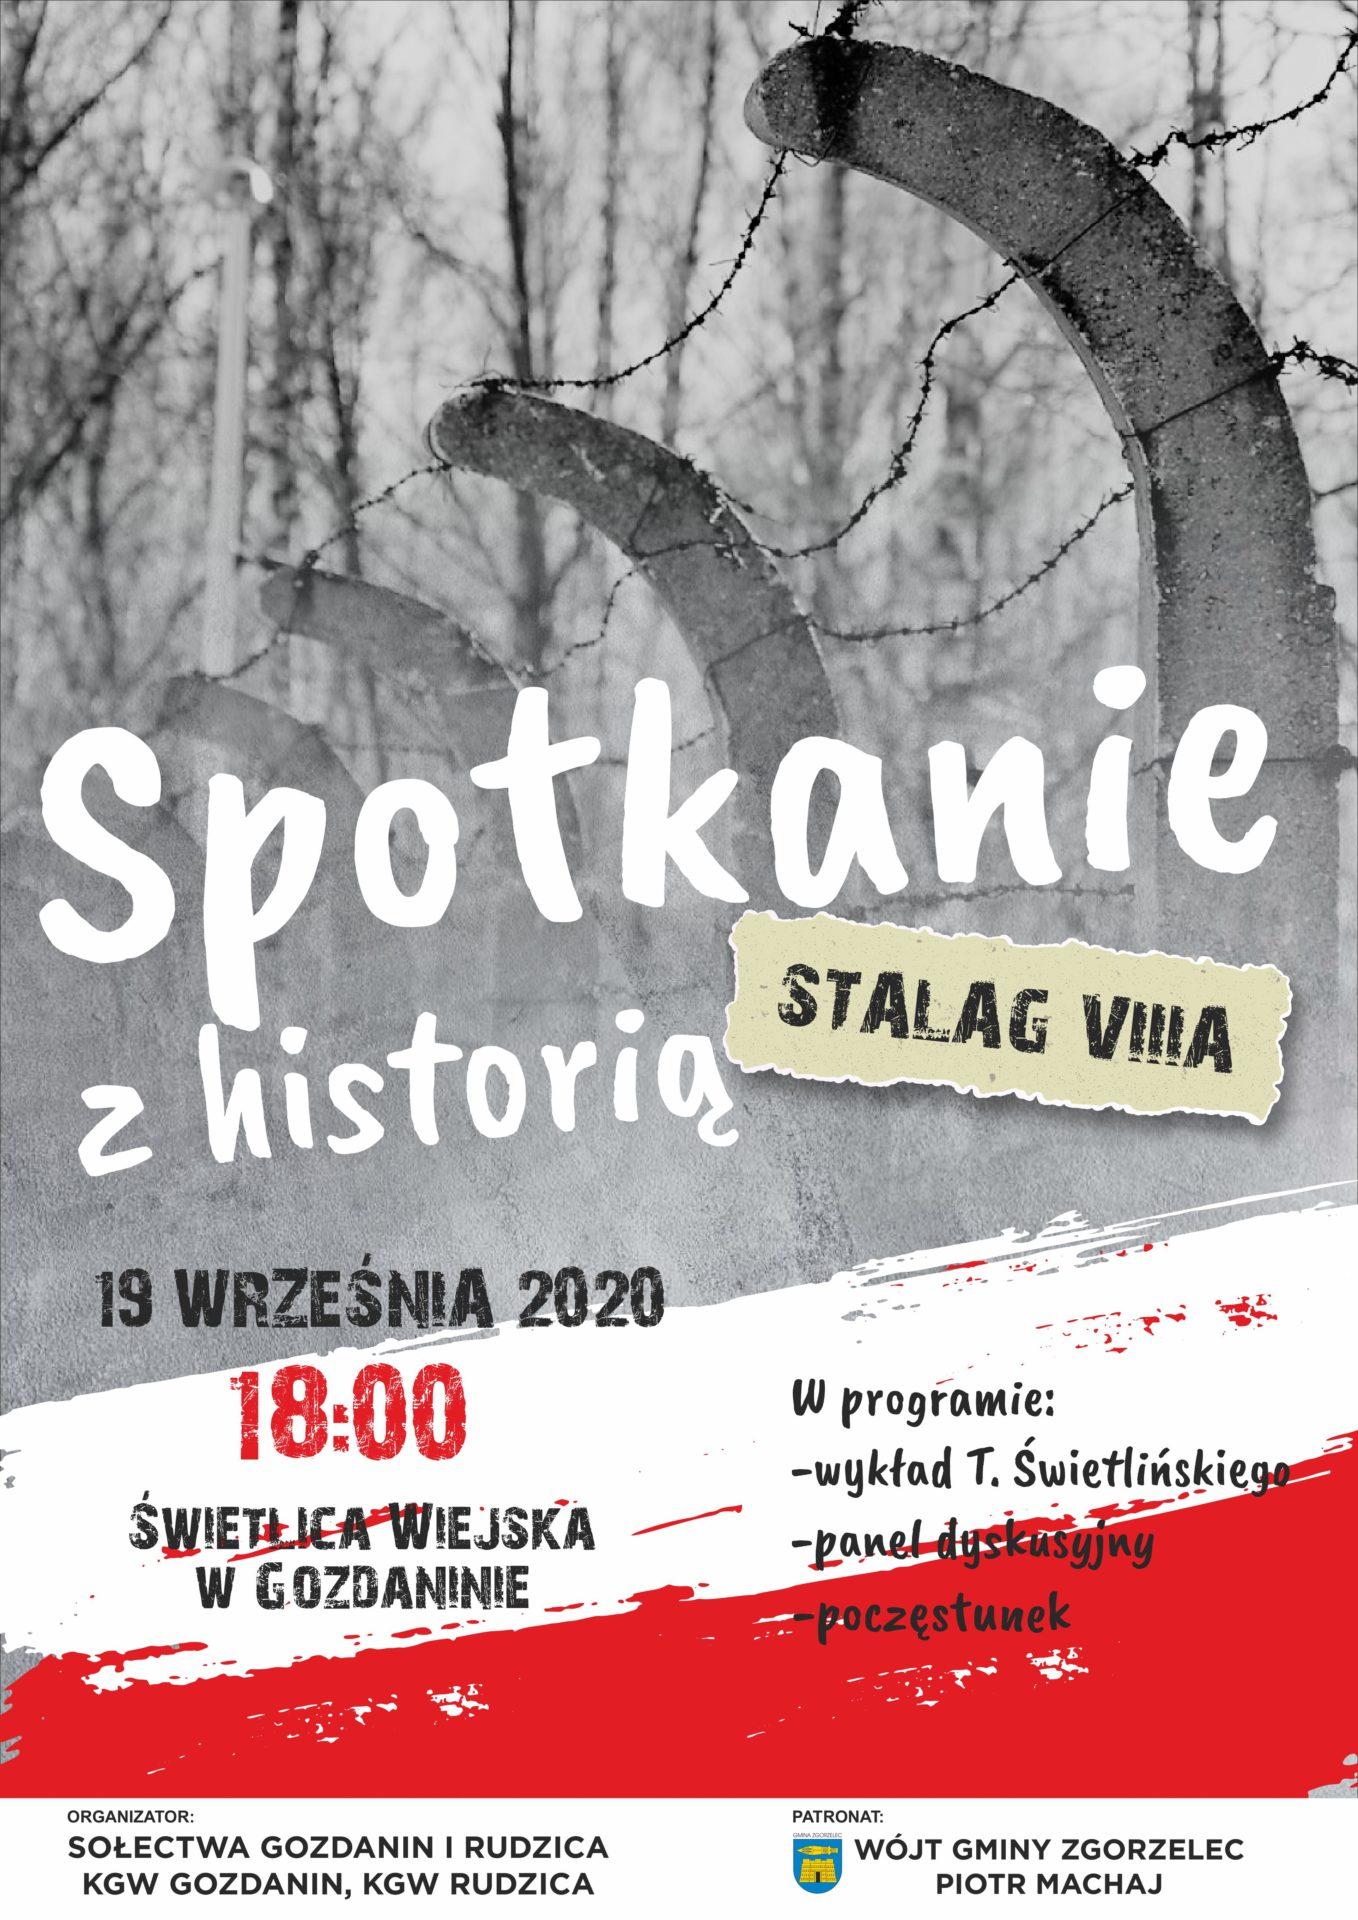 Spotkanie z historią – Stalag VIIIA